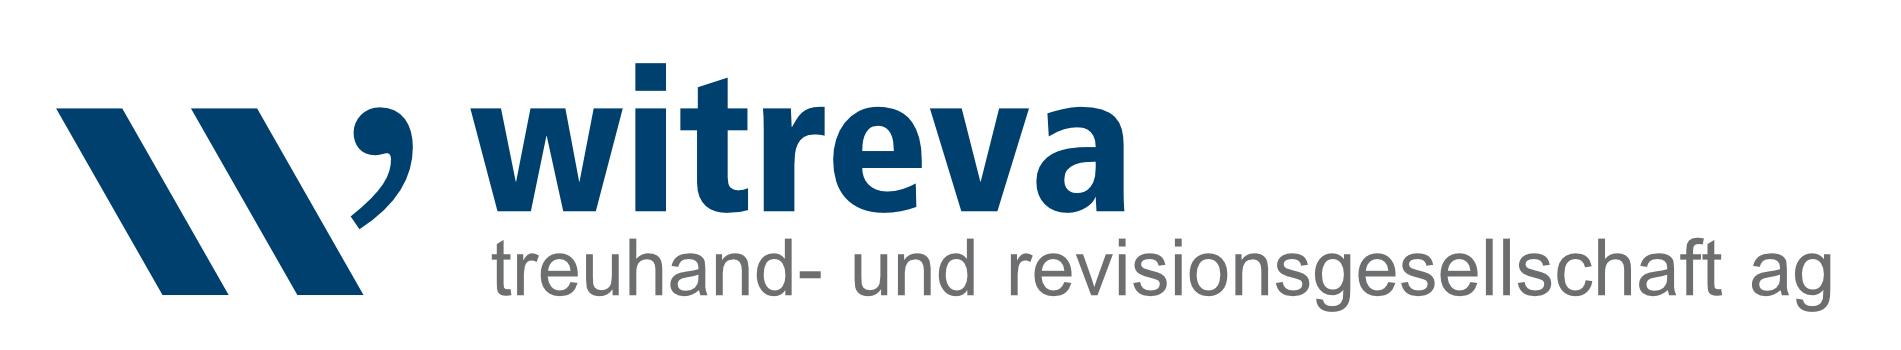 witreva treuhand- und revisionsgesellschaft ag